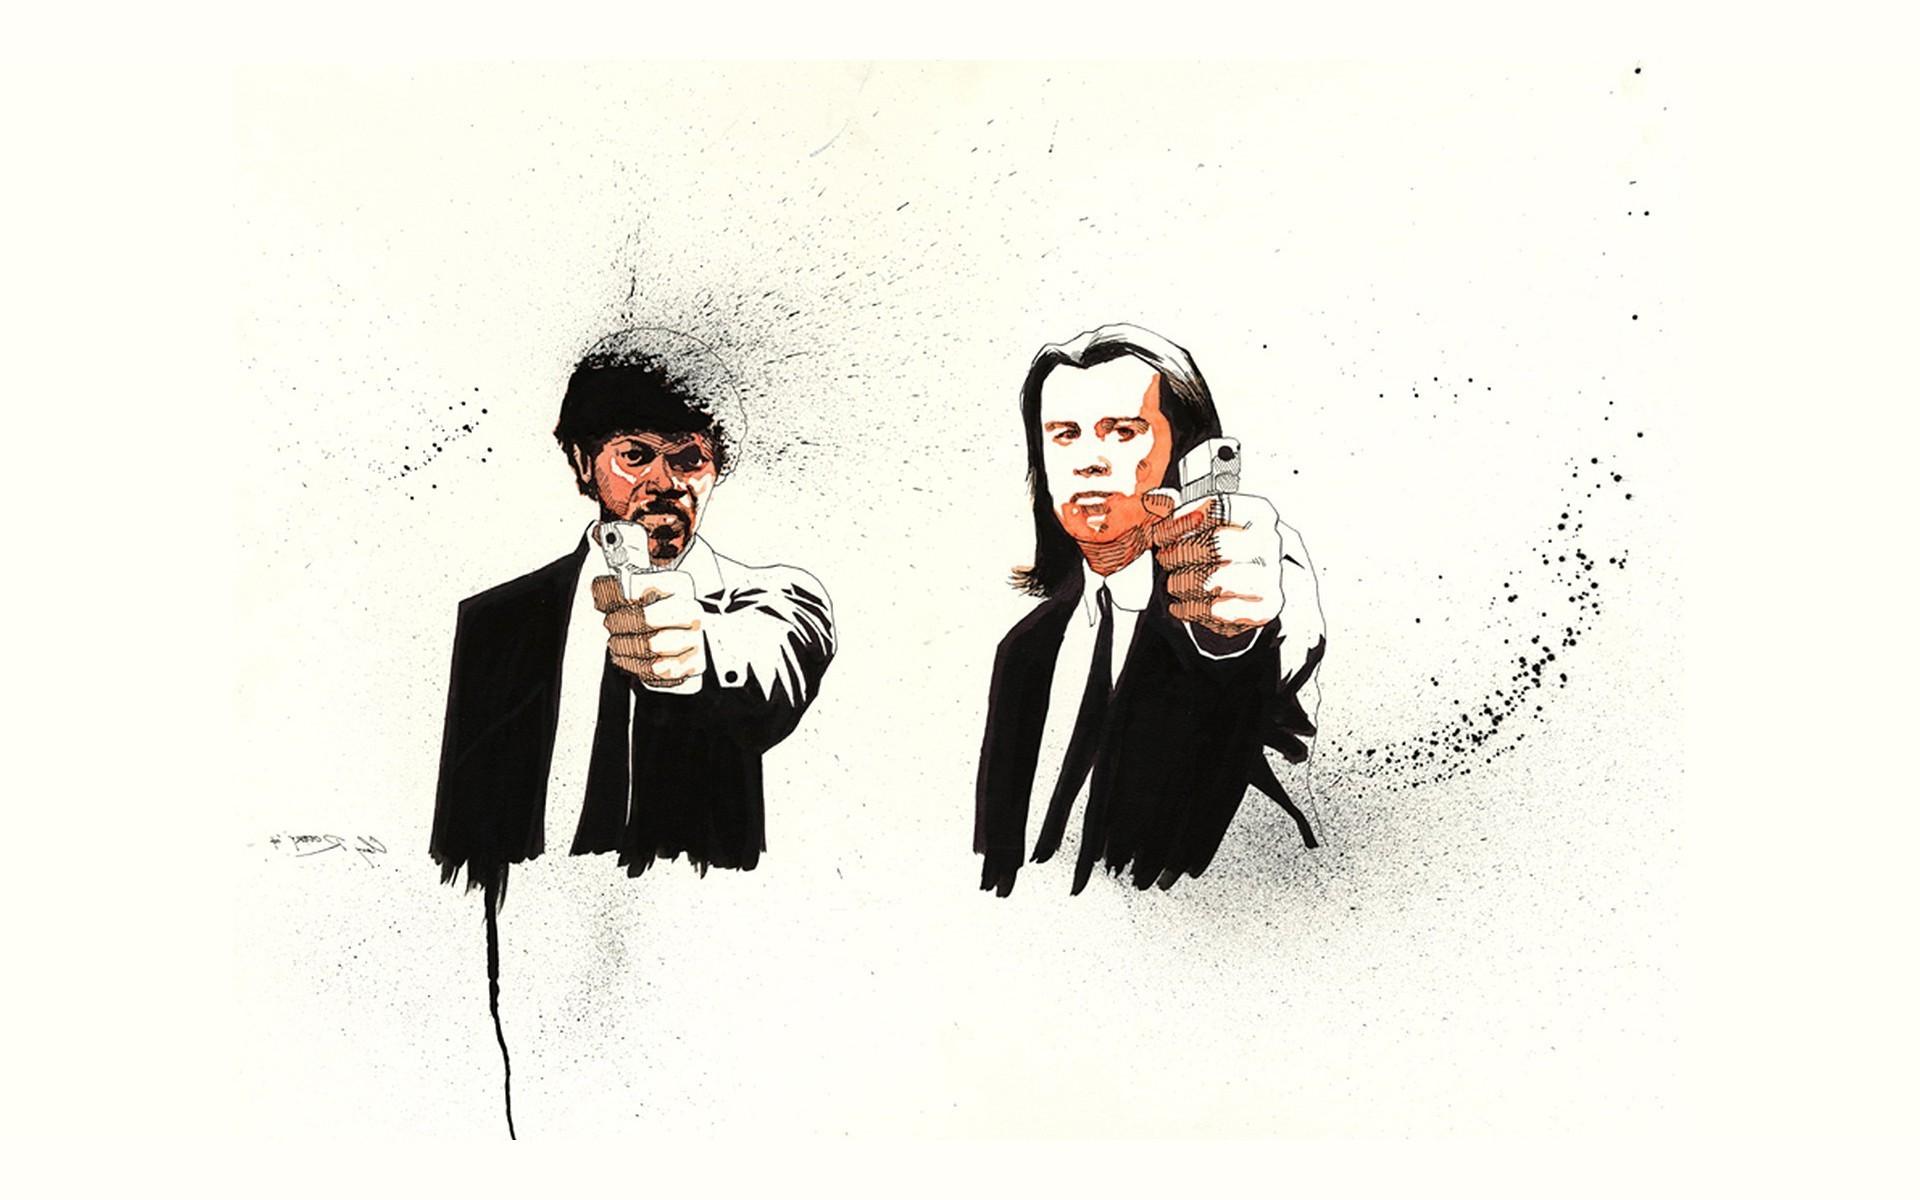 Pulp Fiction, Fan Art, Quentin Tarantino, Movies, Samuel L. Jackson  Wallpapers HD / Desktop and Mobile Backgrounds